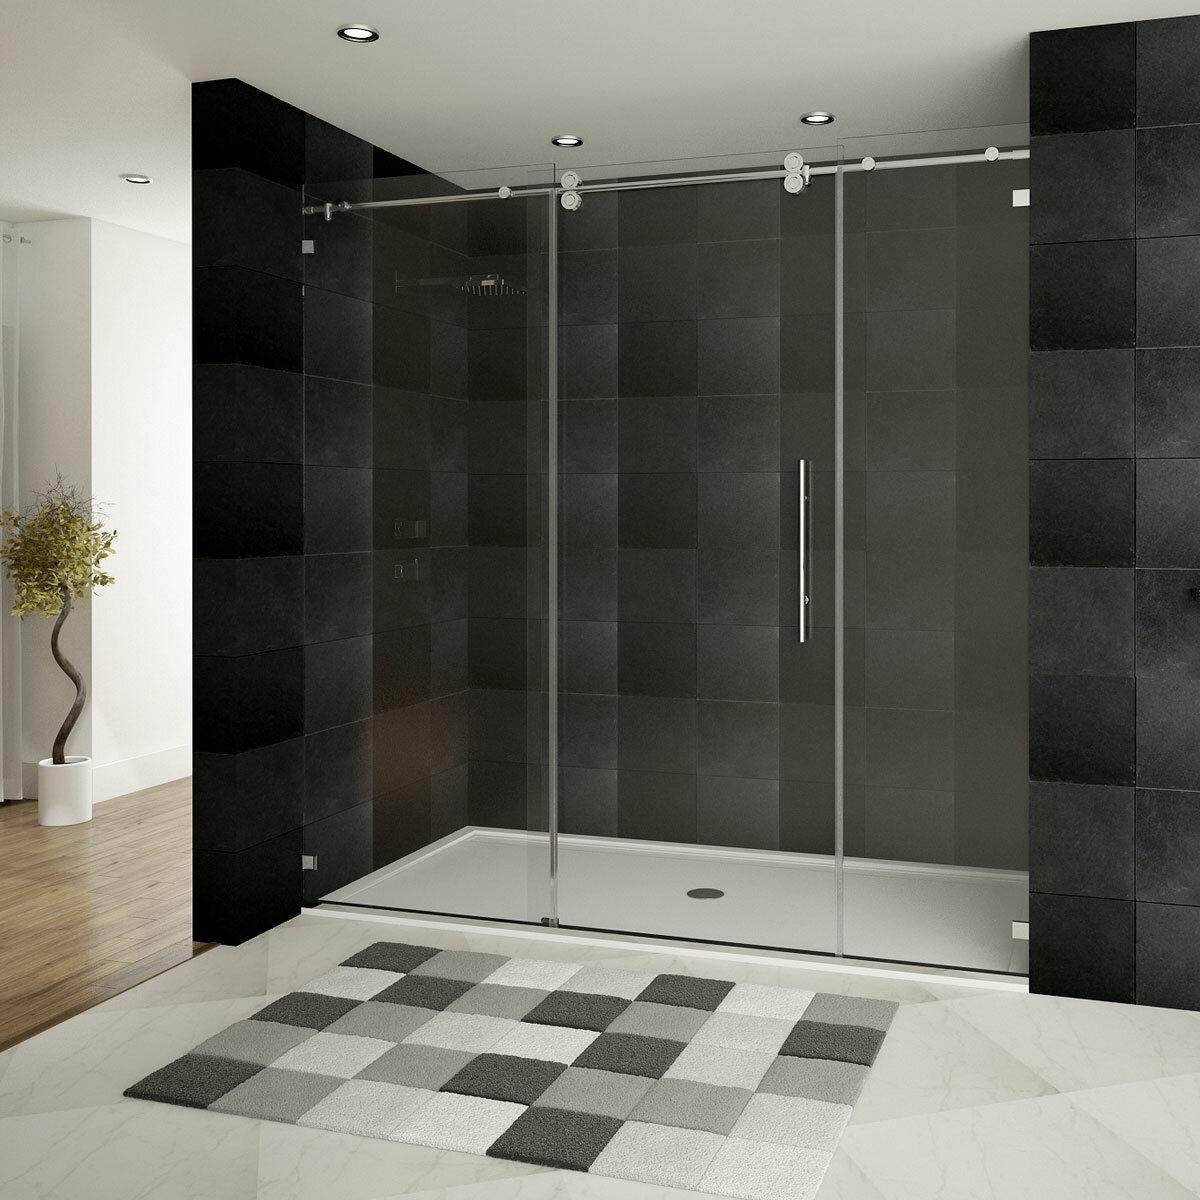 Ultra D 72 X 79 Single Sliding Frameless Shower Door With Double Front Panel